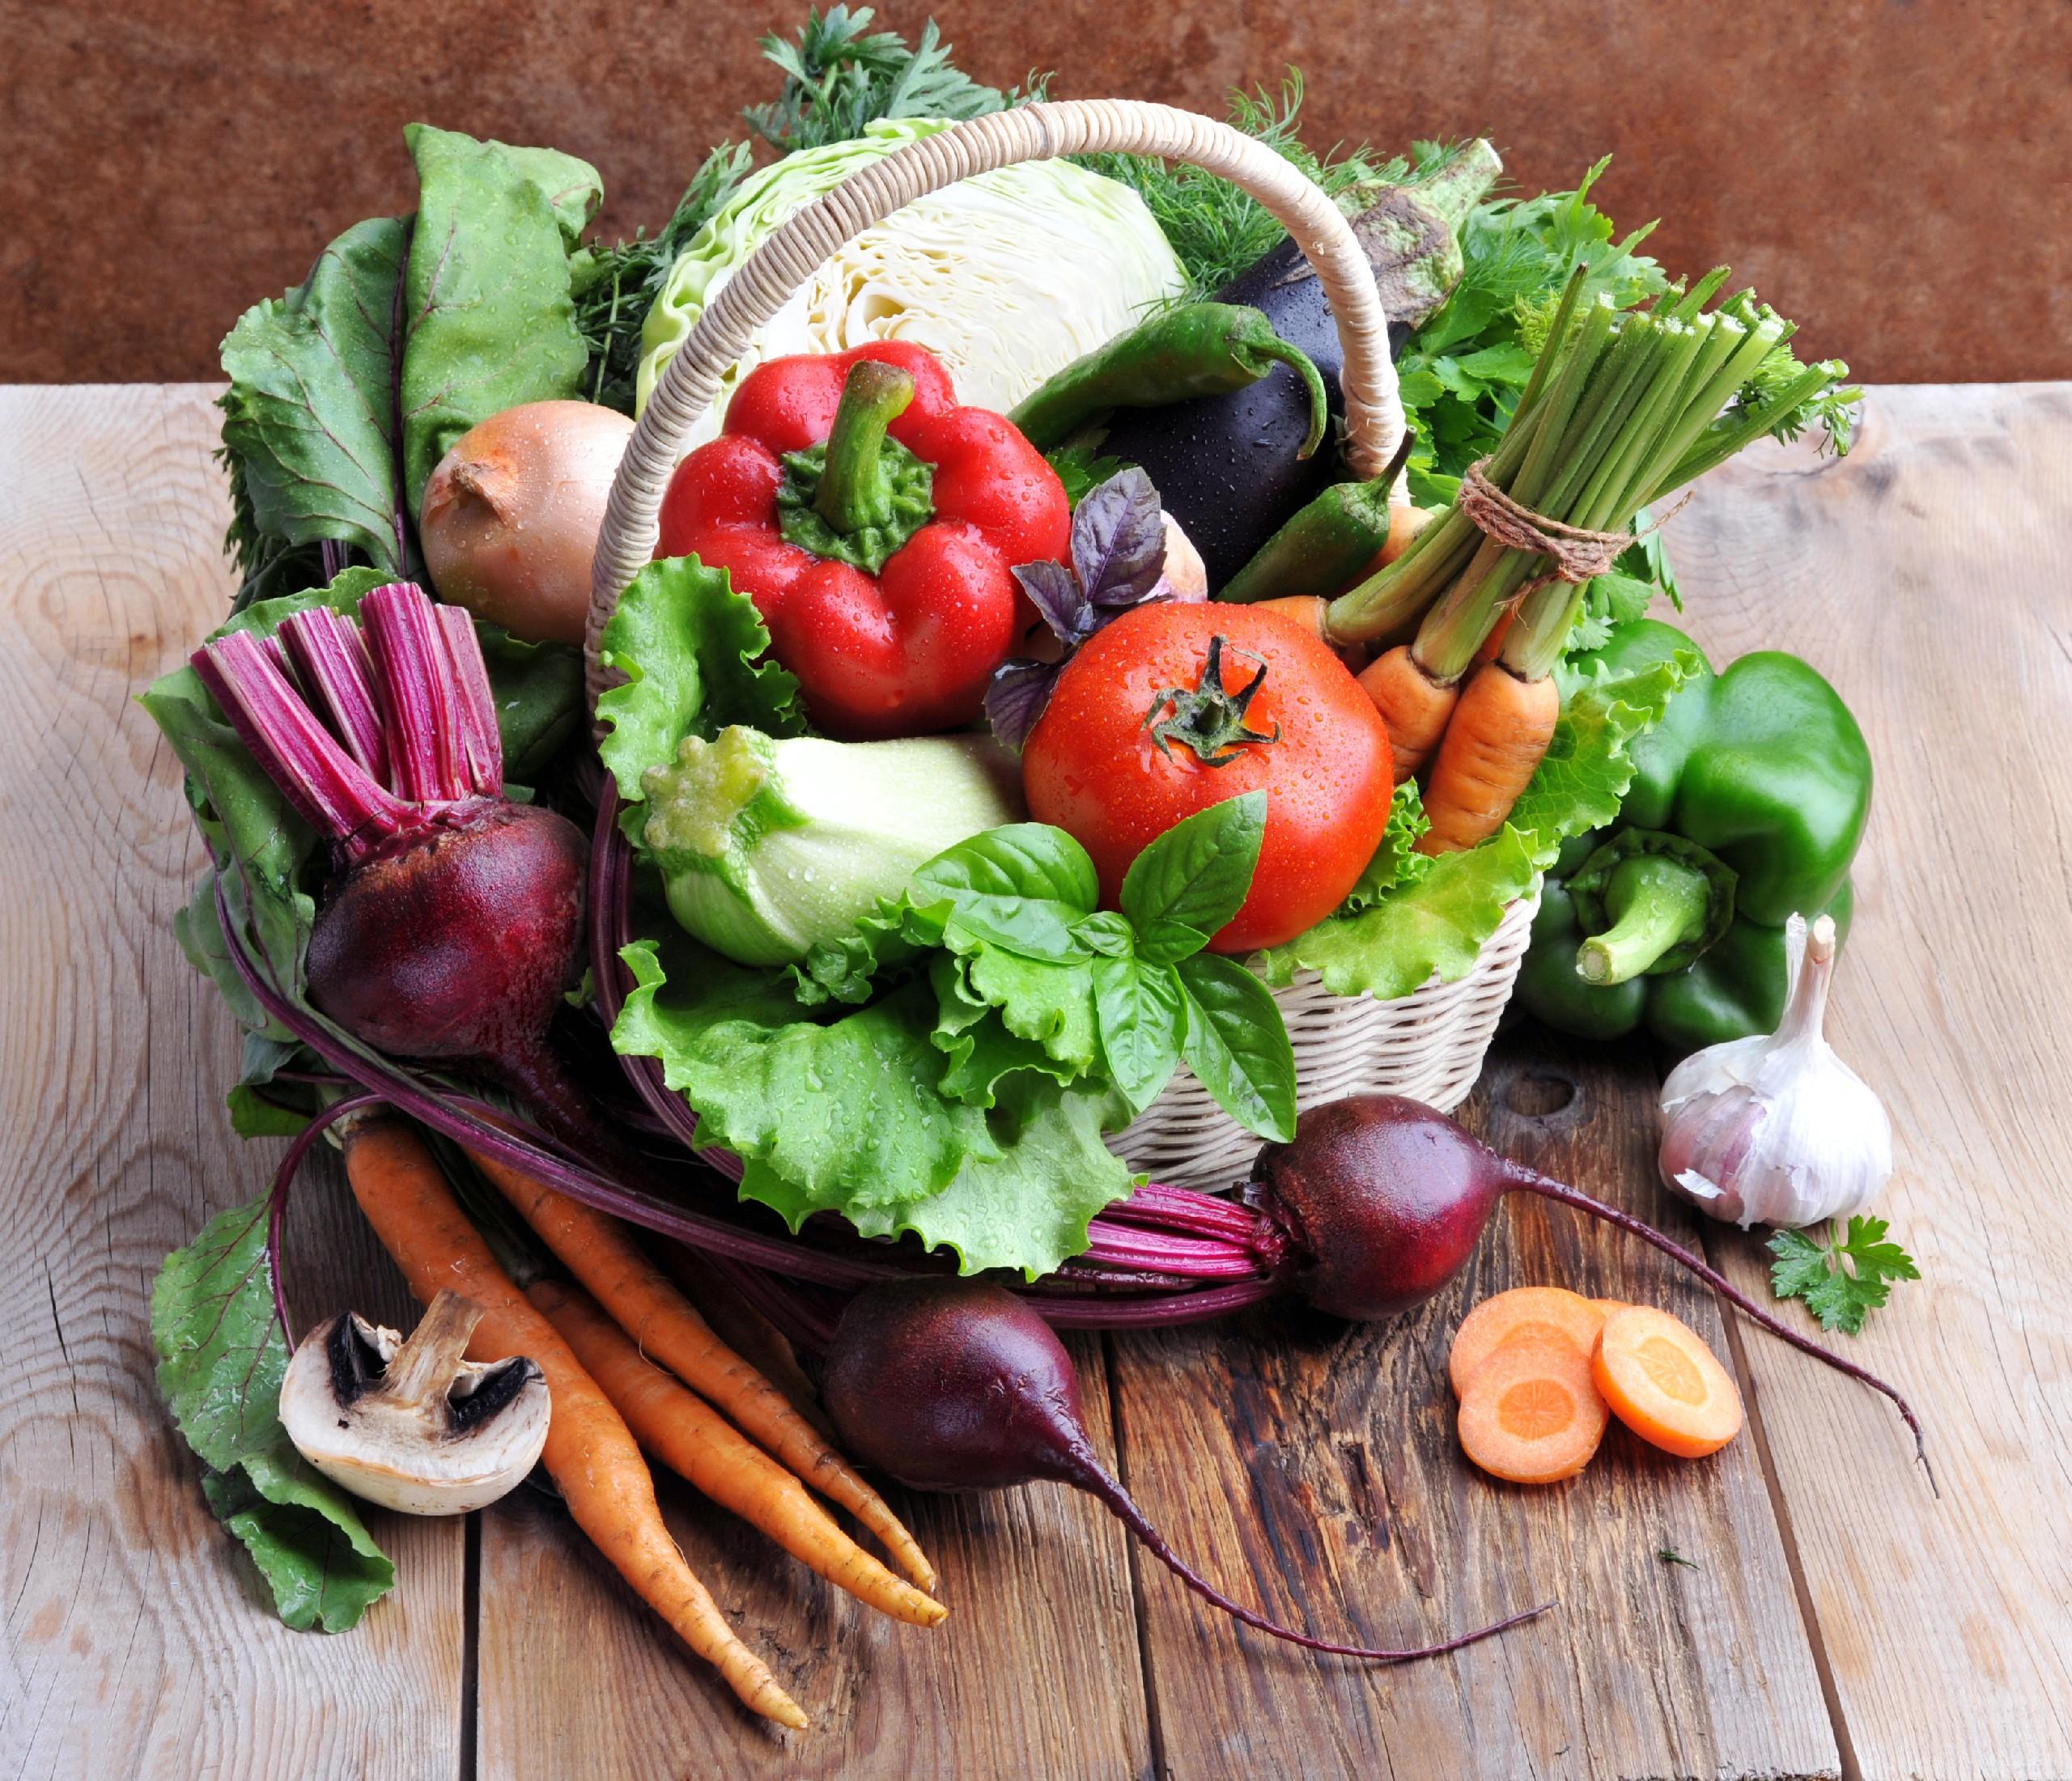 чаще картинки про овощей храм традиционном